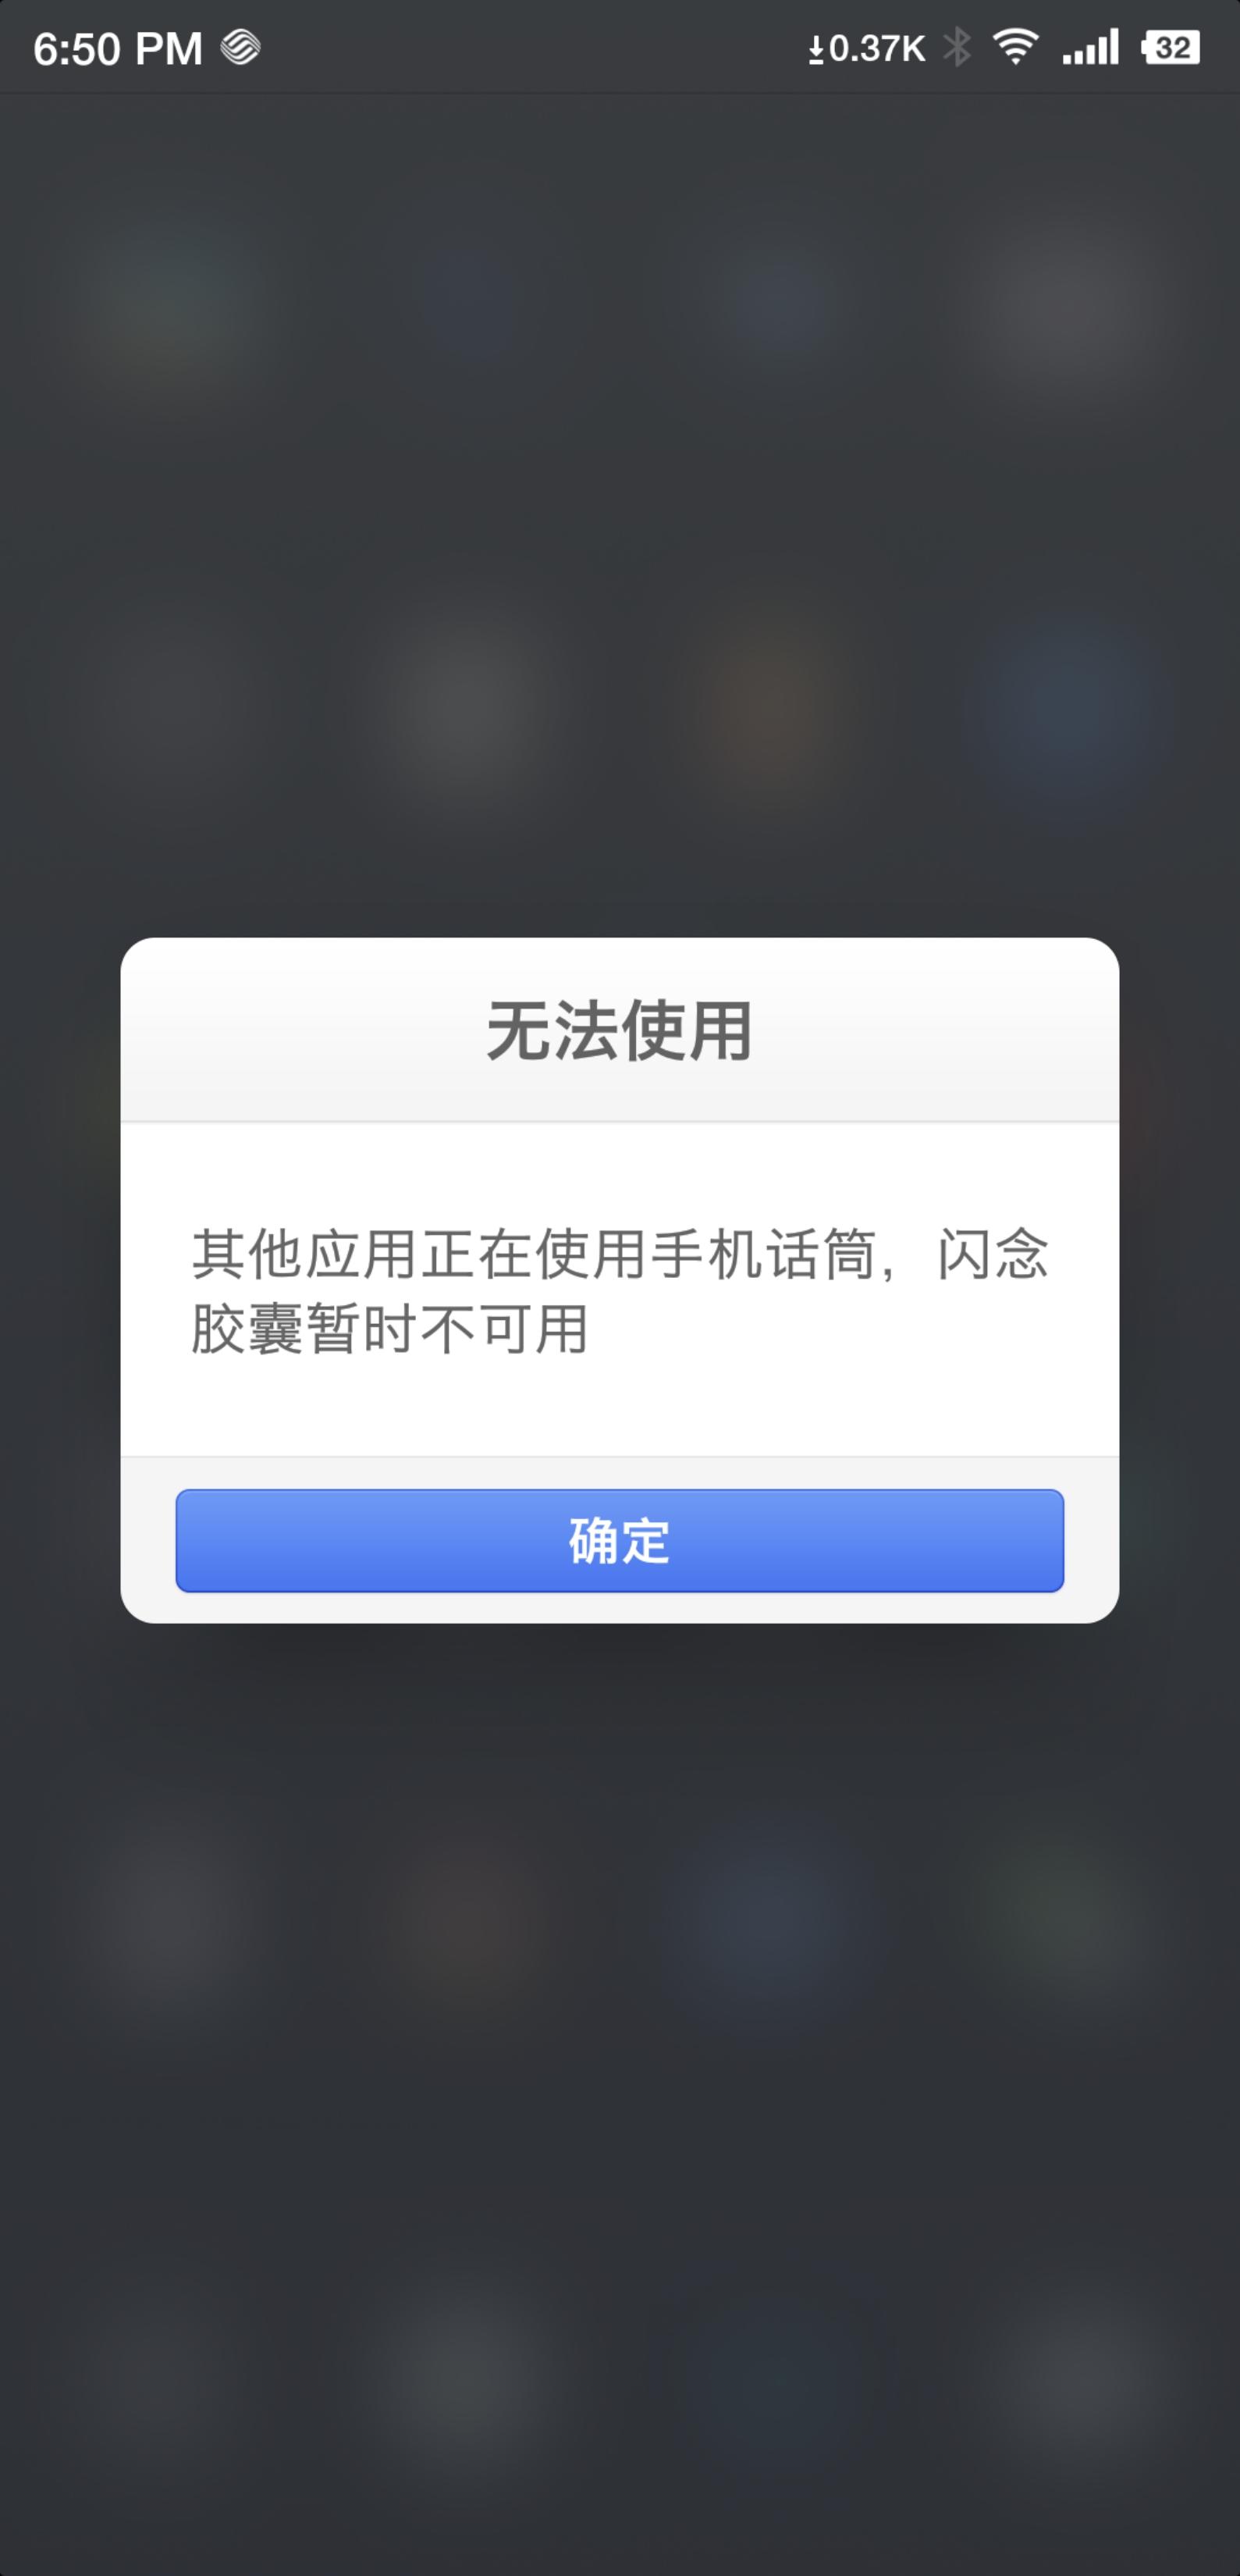 Screenshot_2018-08-26-18-50-02-048_????.png